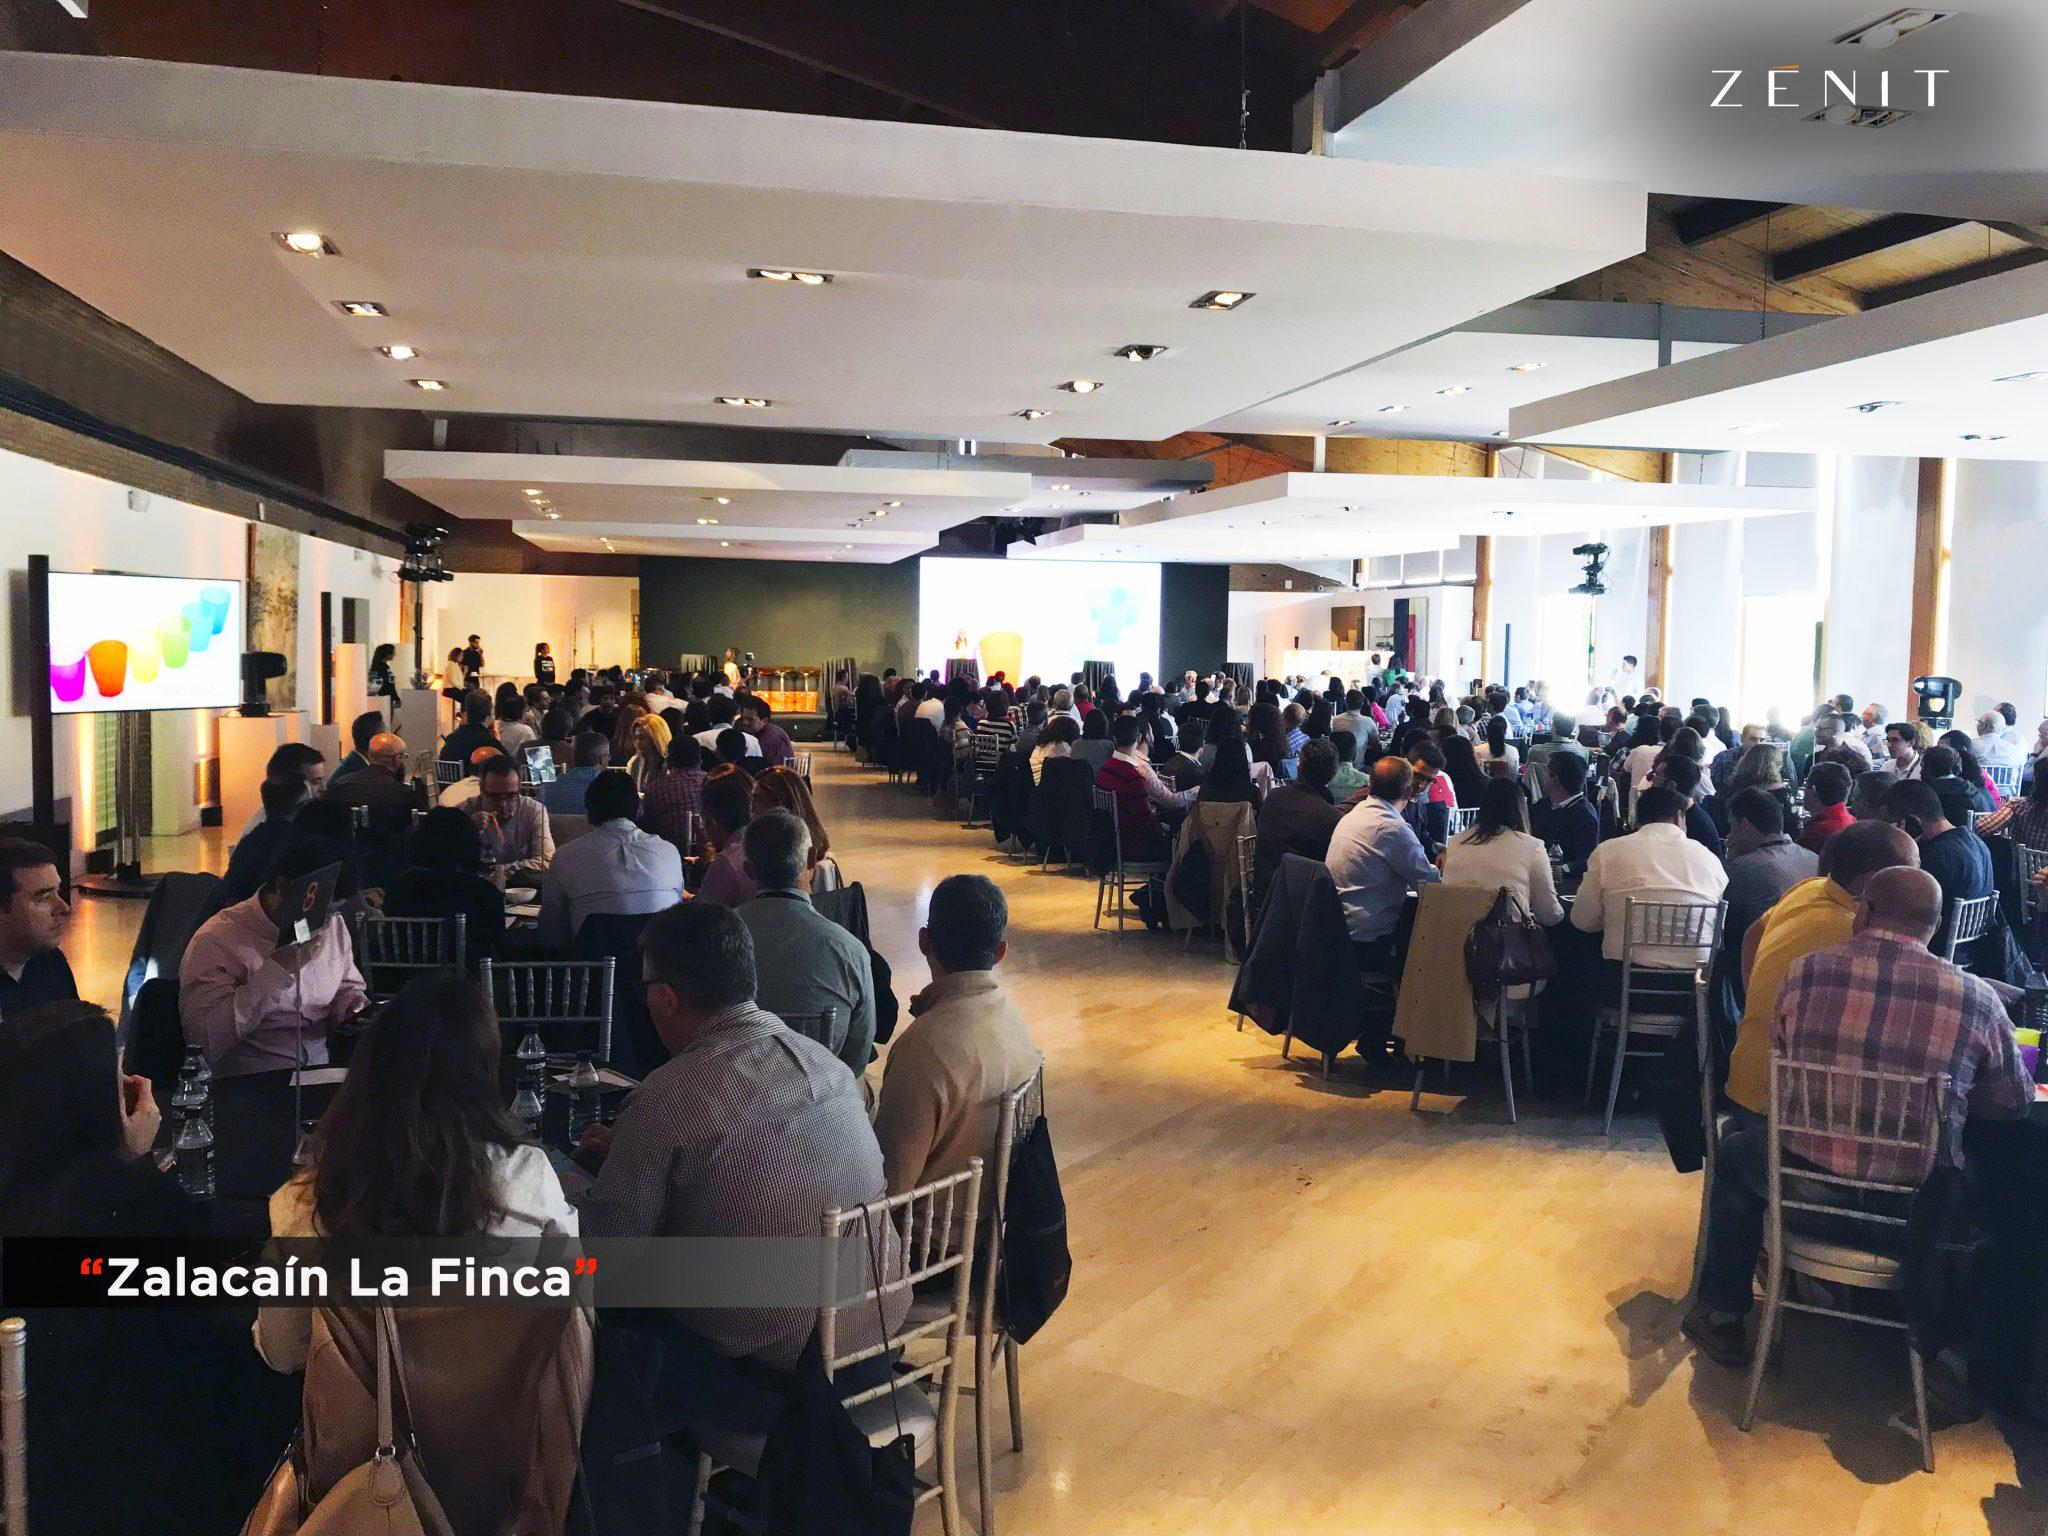 Zenit Event Experts. Zalacaín la Finca.